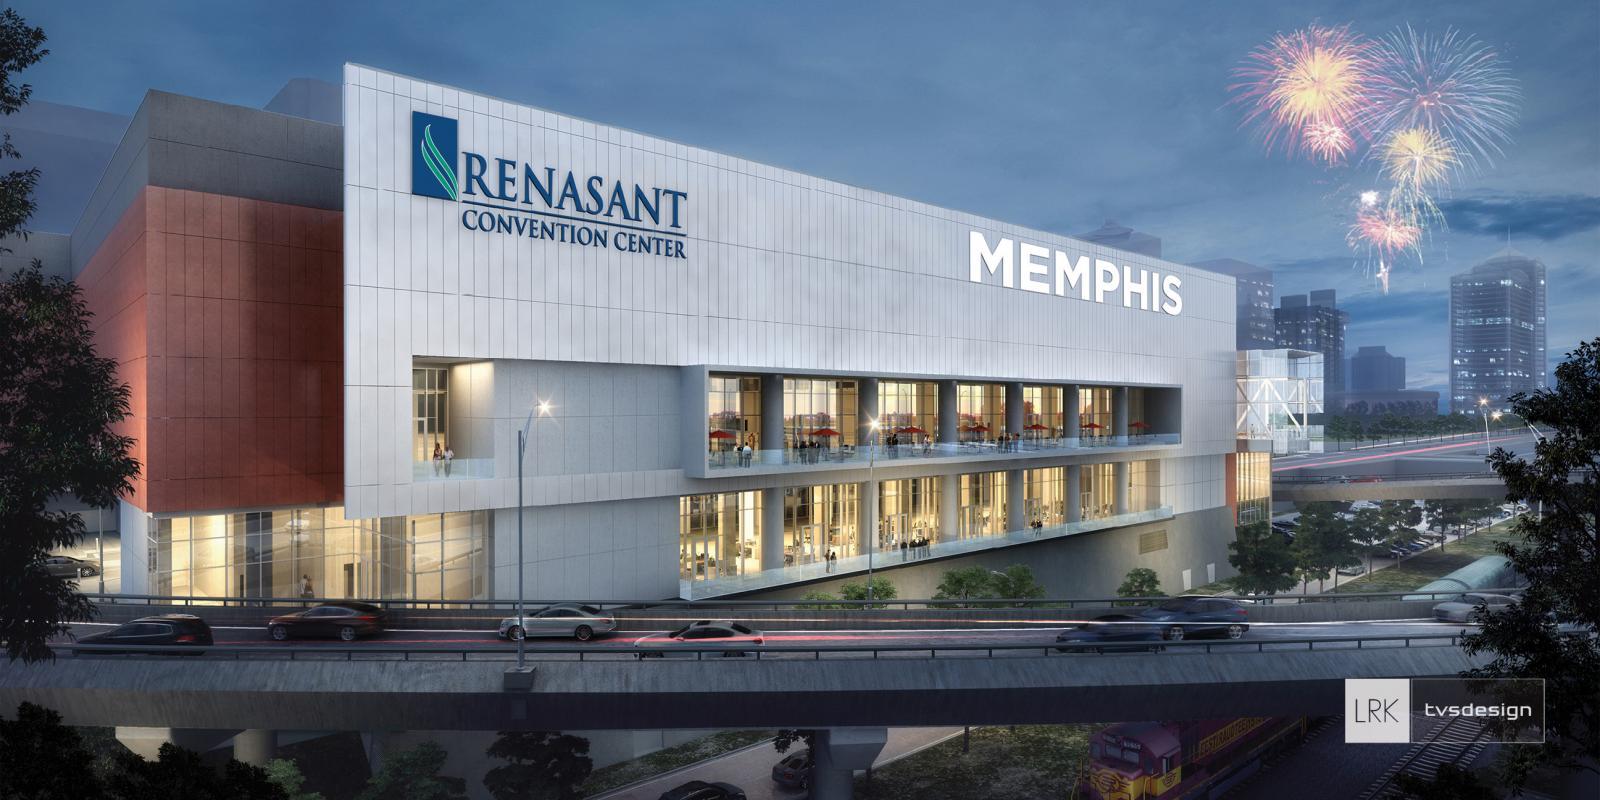 Renasant Convention Center